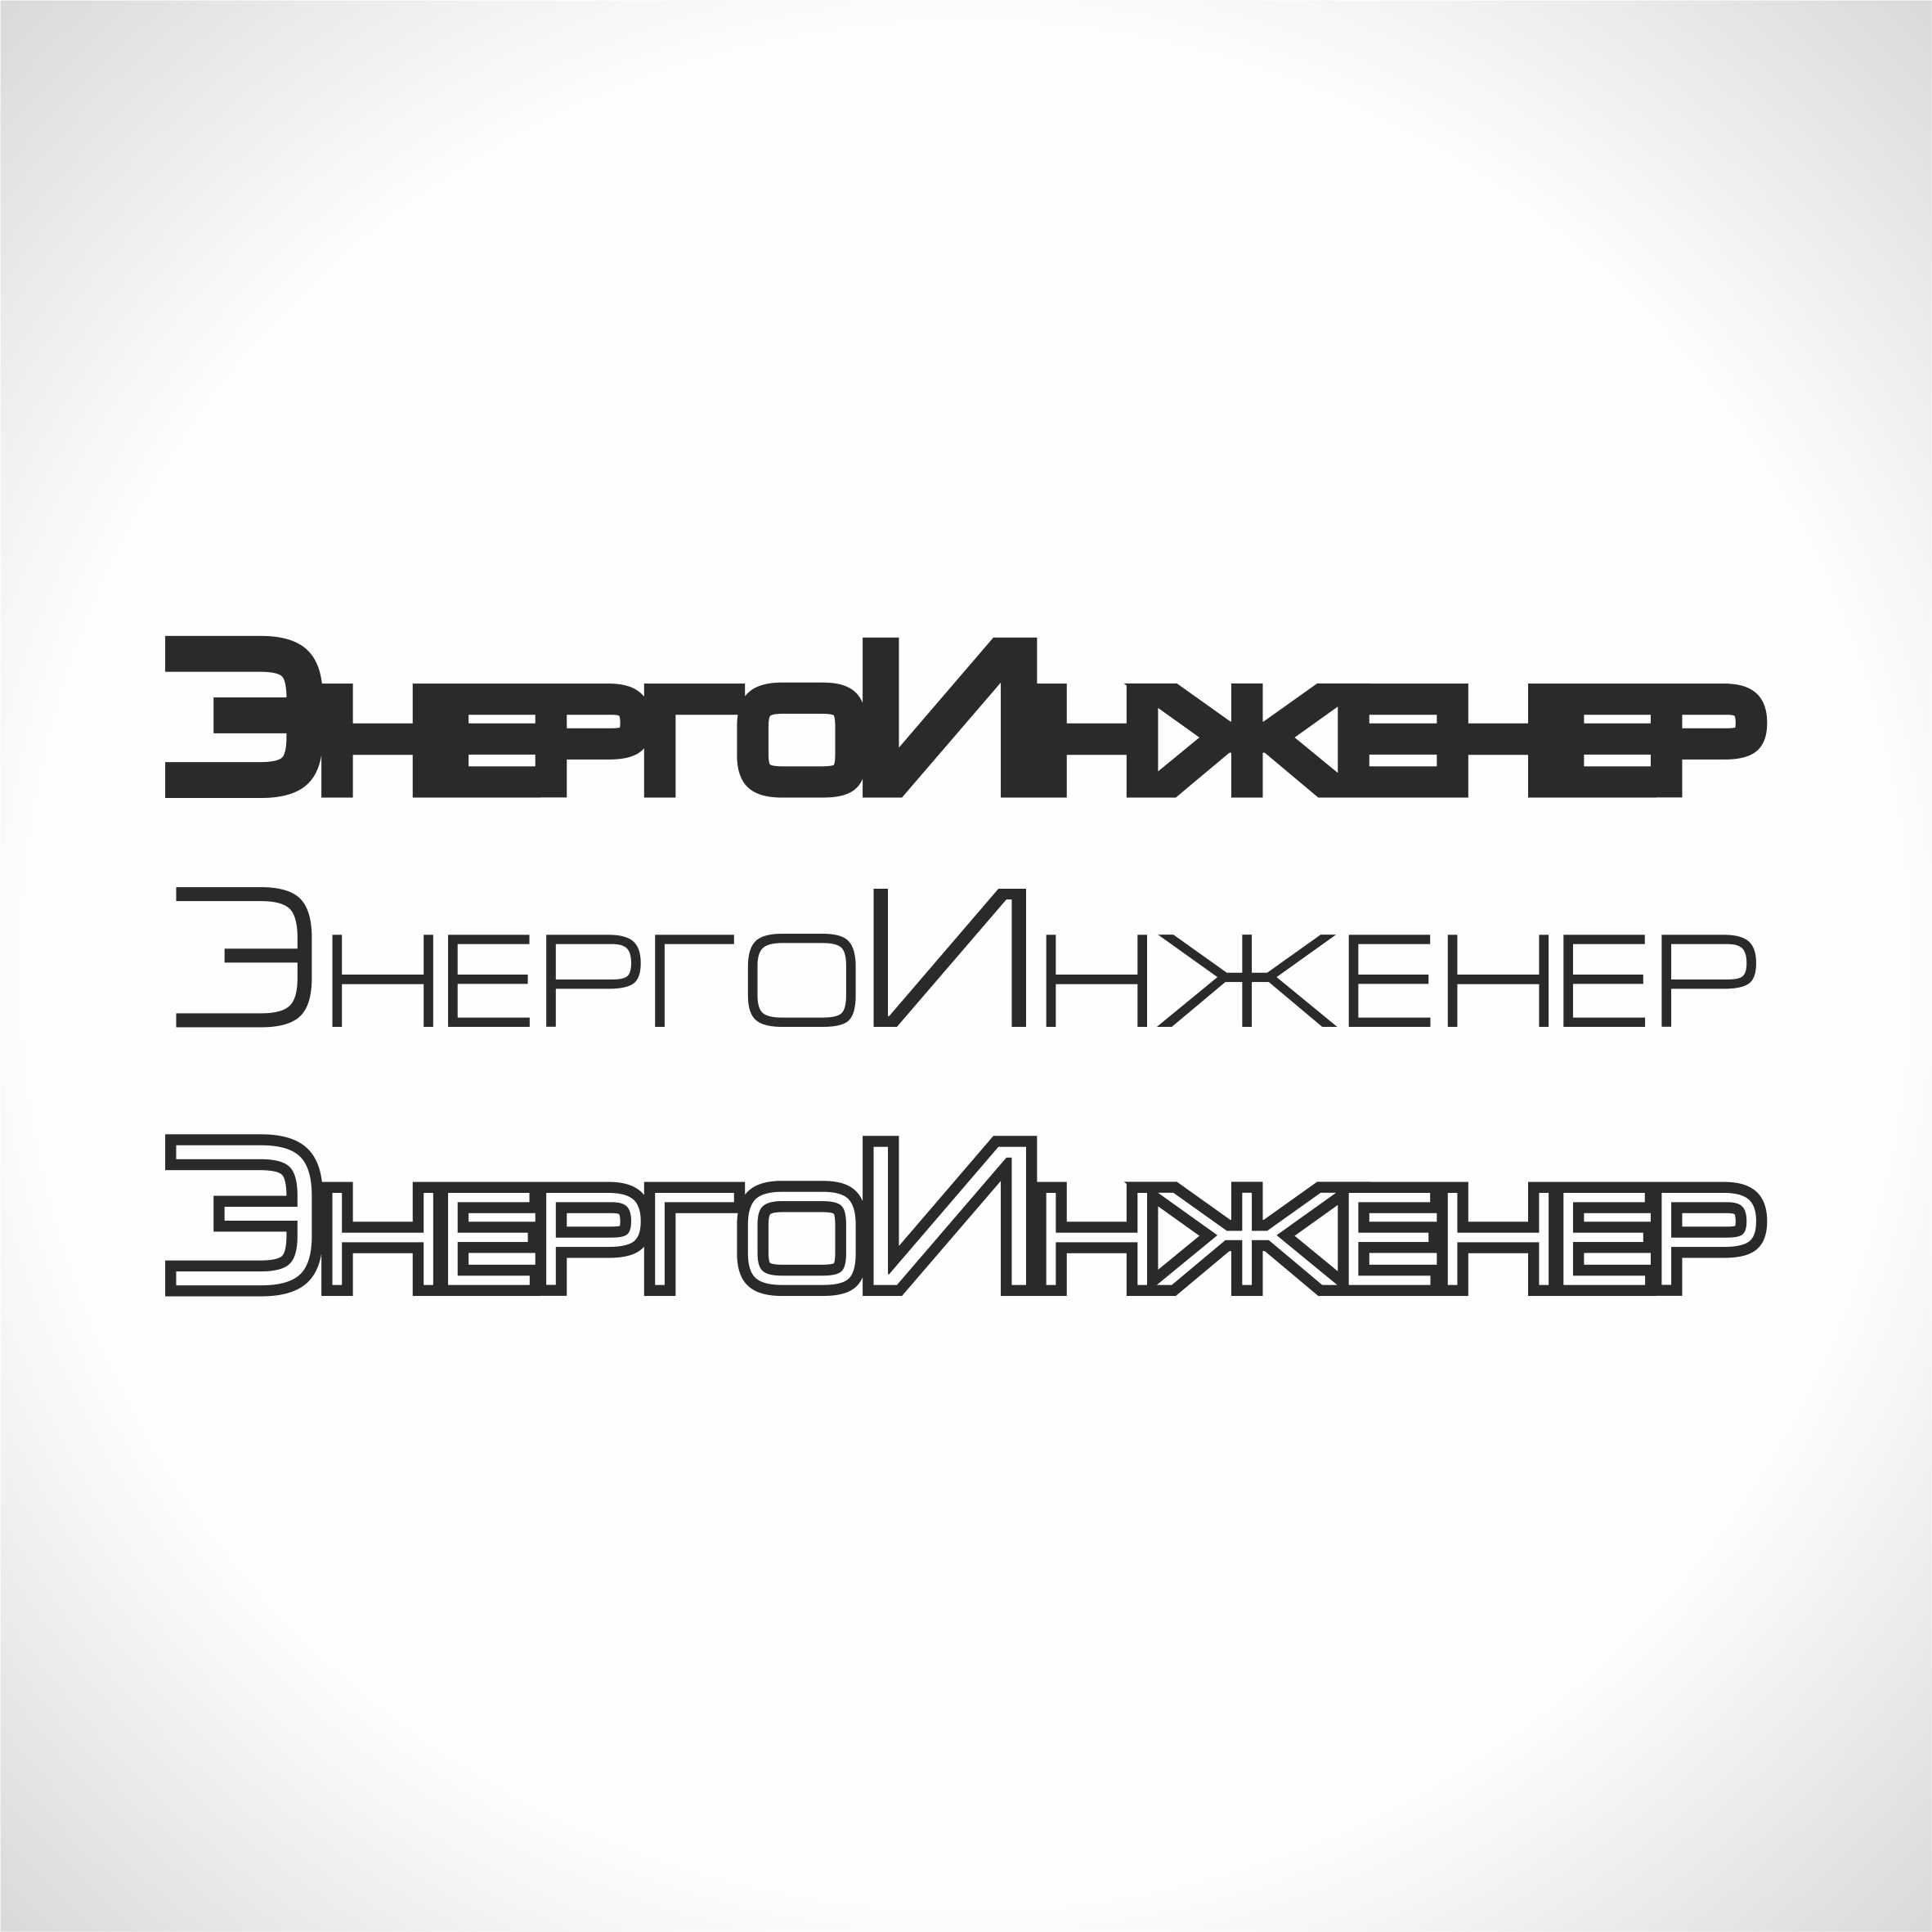 Логотип для инженерной компании фото f_79551c91f42e13f8.jpg